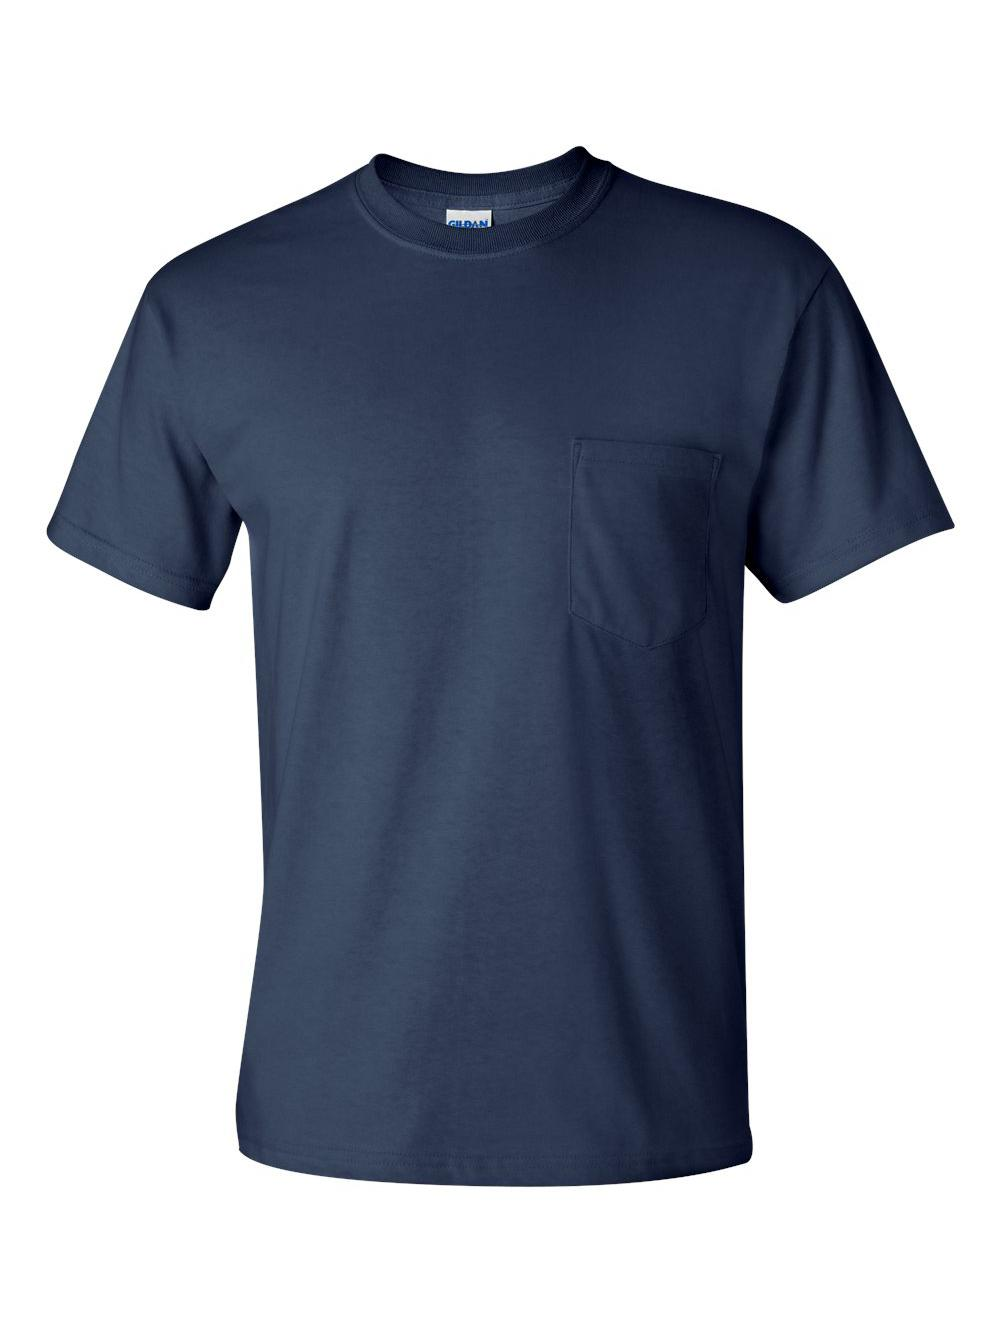 Gildan-Ultra-Cotton-T-Shirt-with-a-Pocket-2300 thumbnail 21